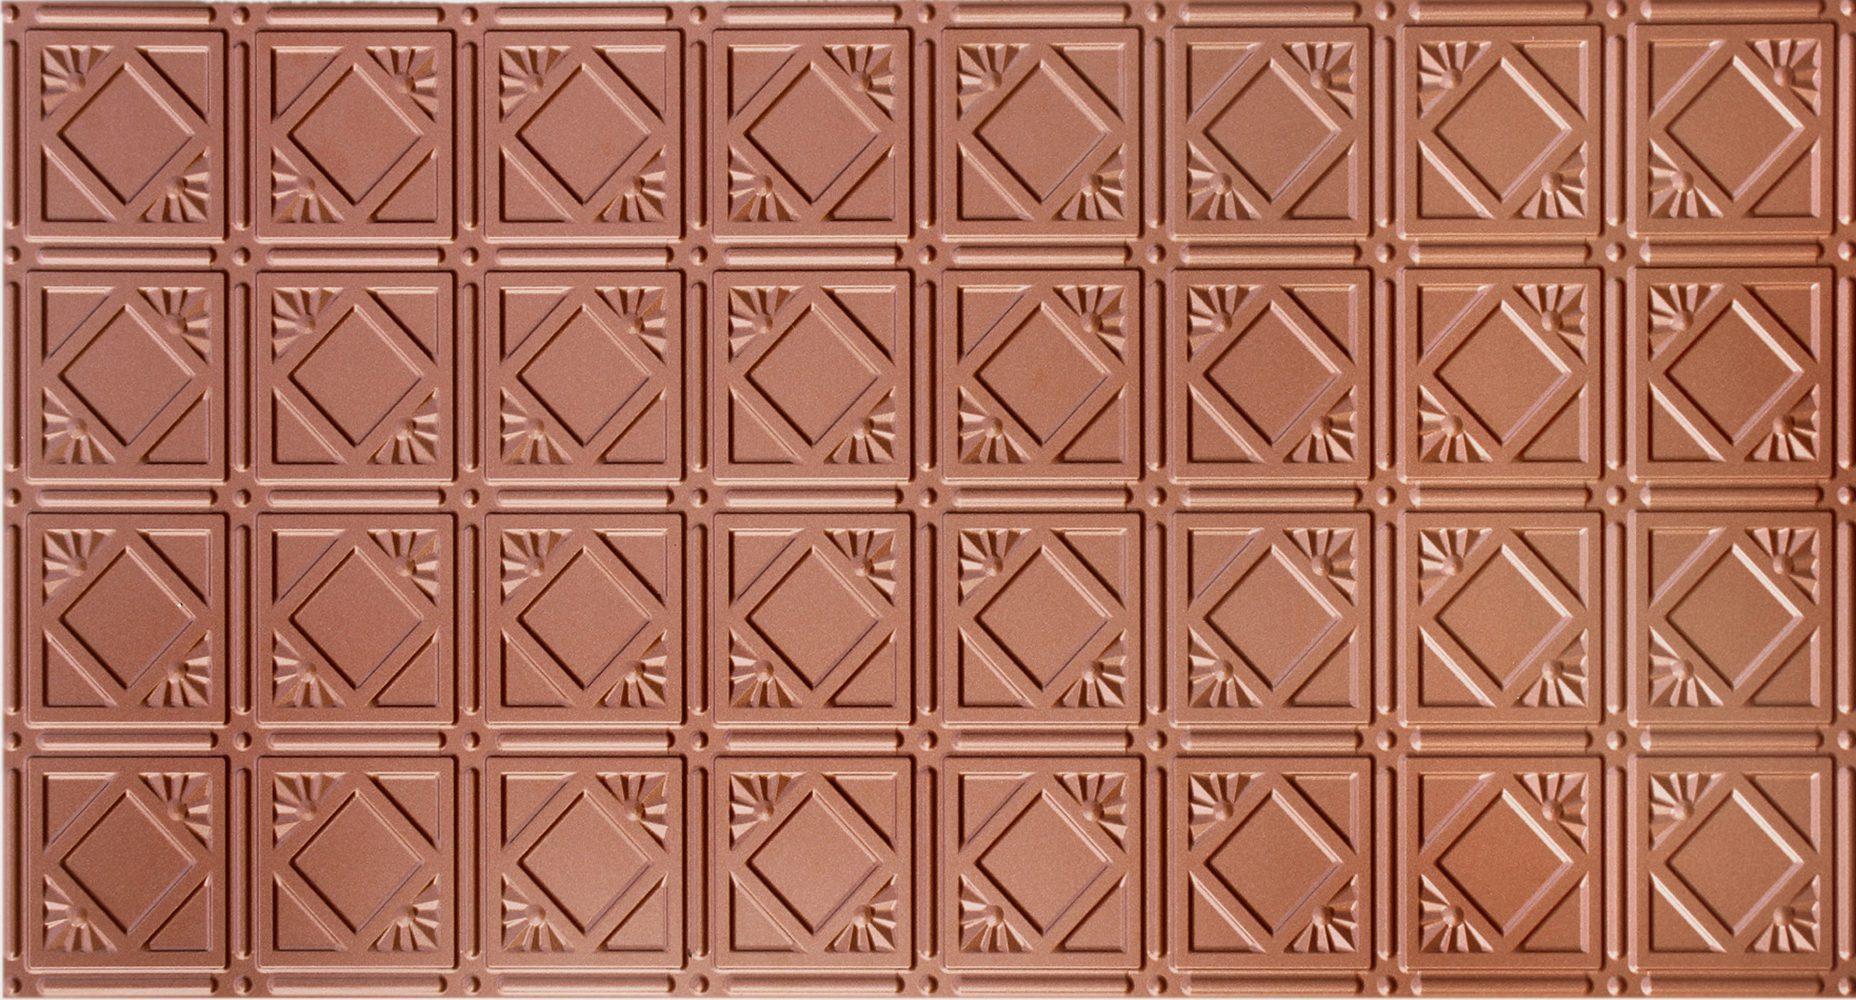 Ceiling tiles as backsplash